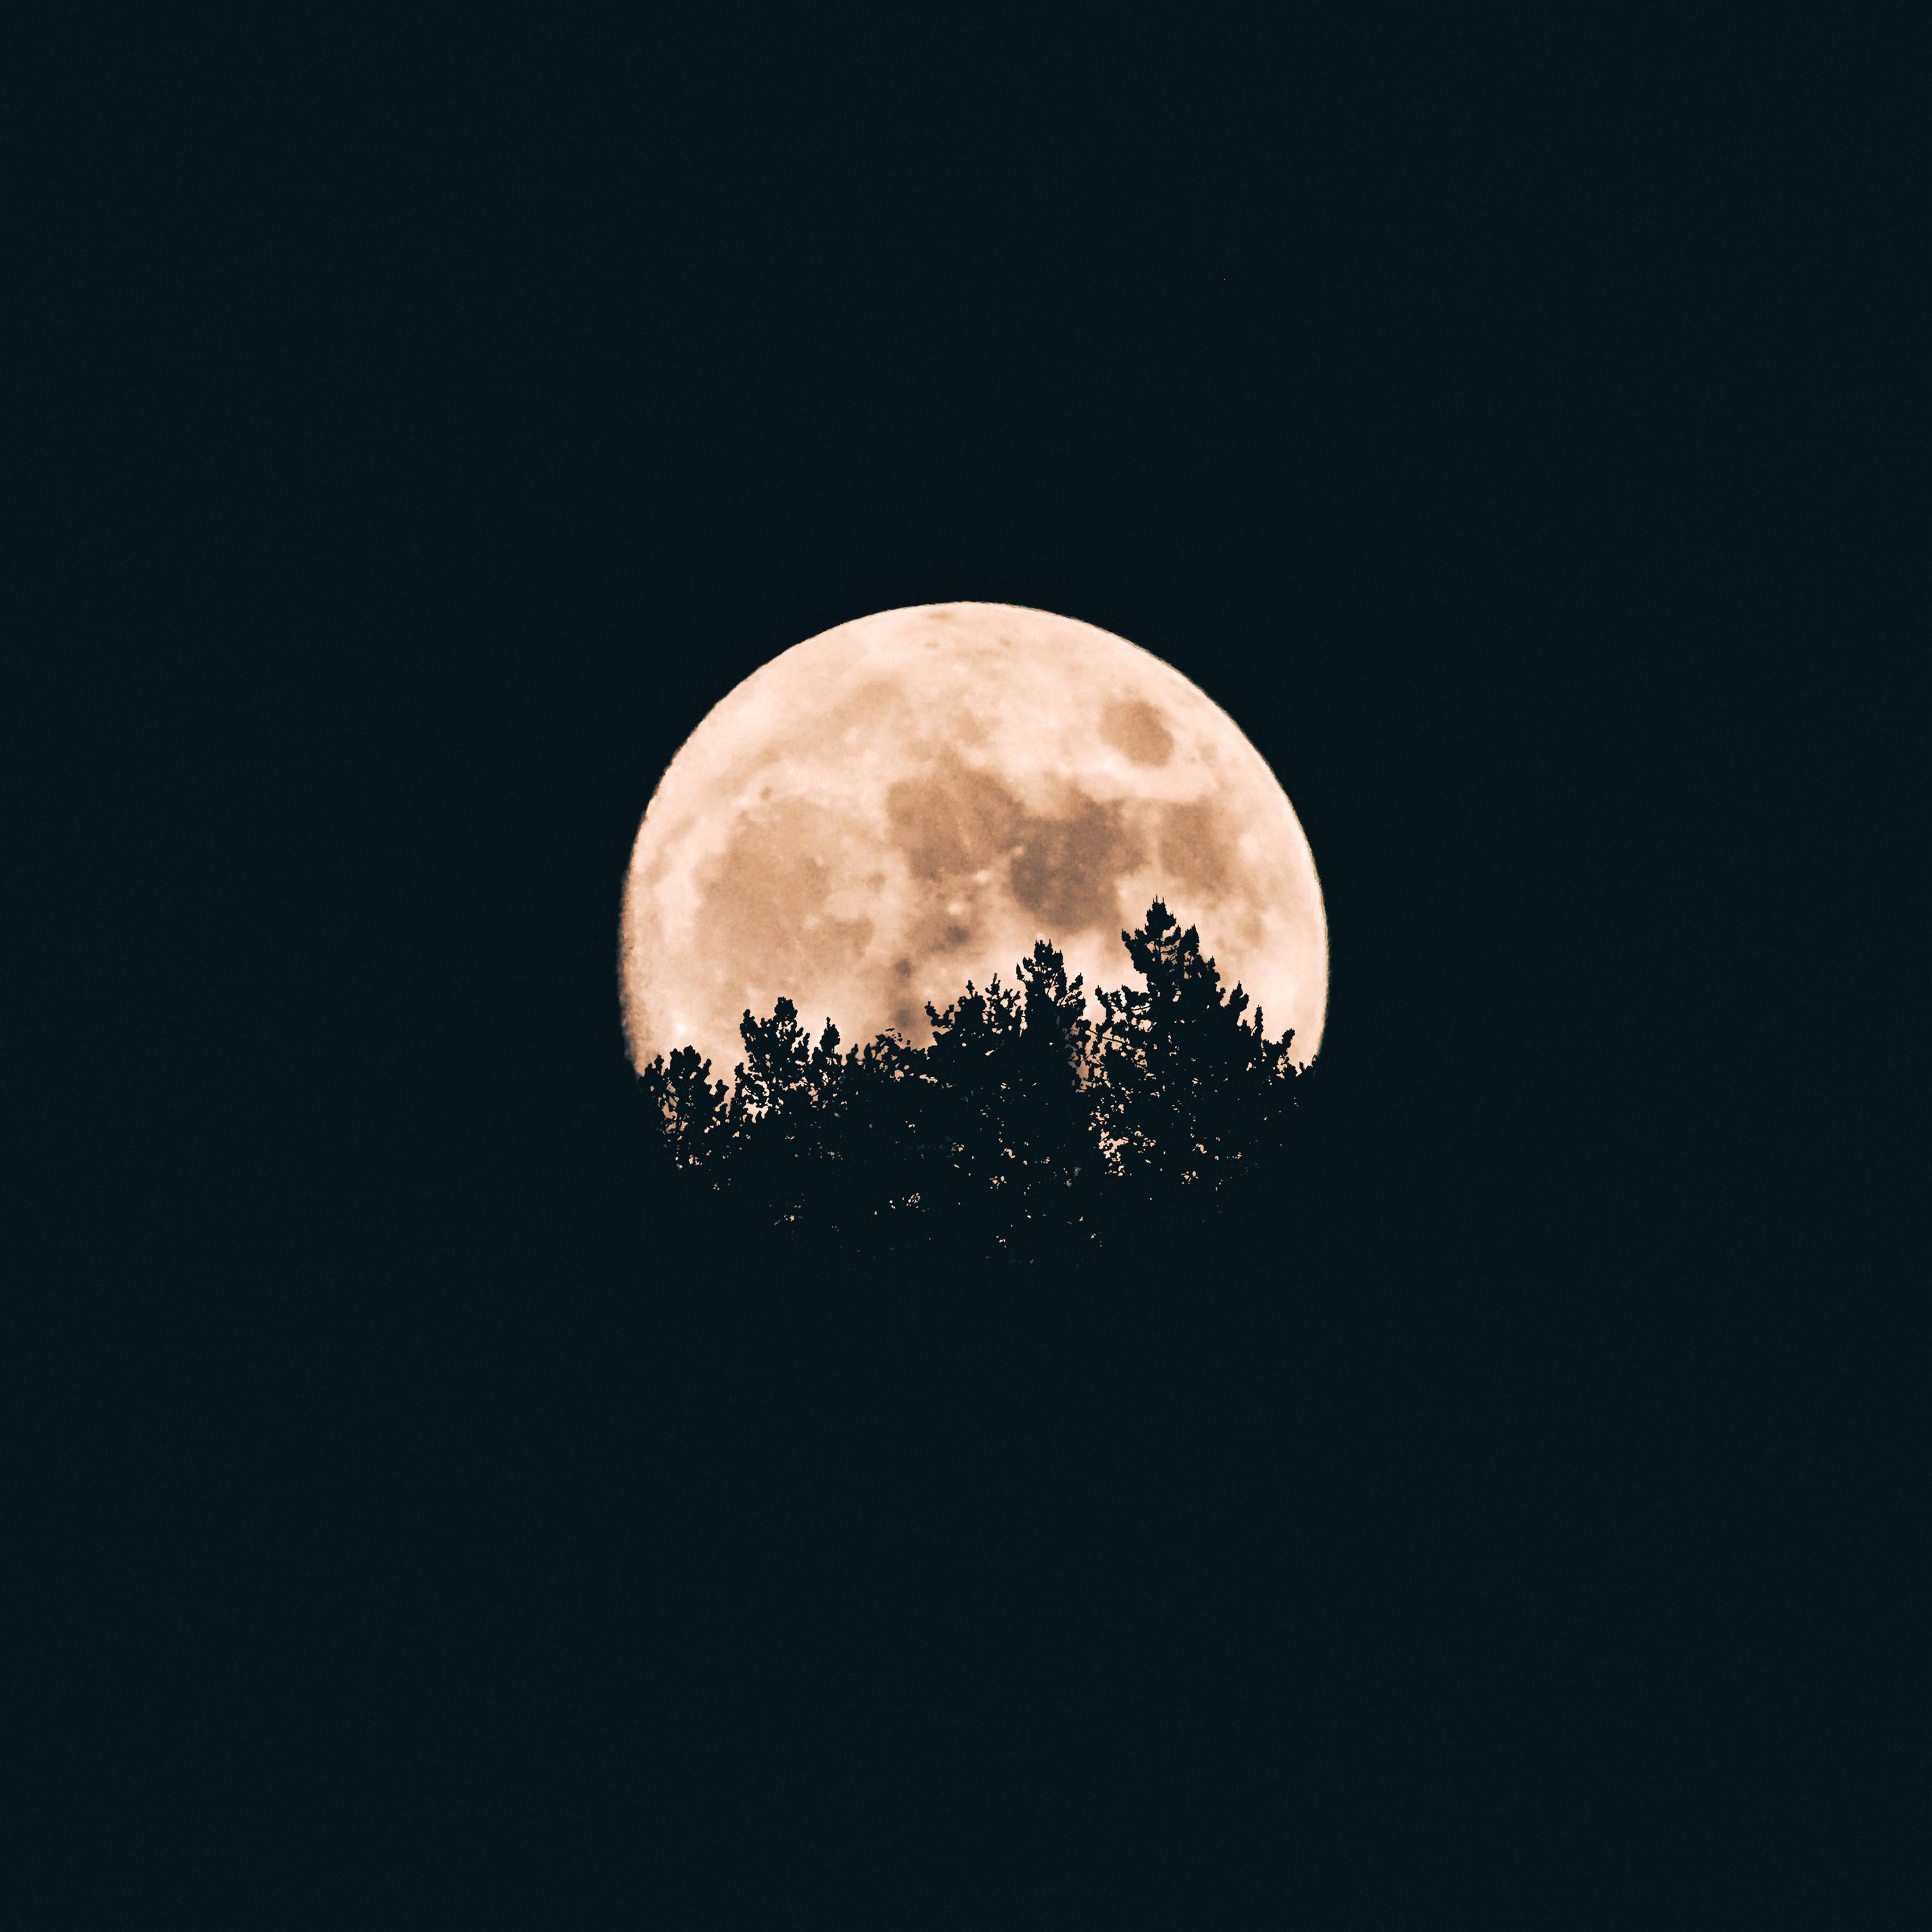 2780x2780 Wallpaper moon, trees, dark, night